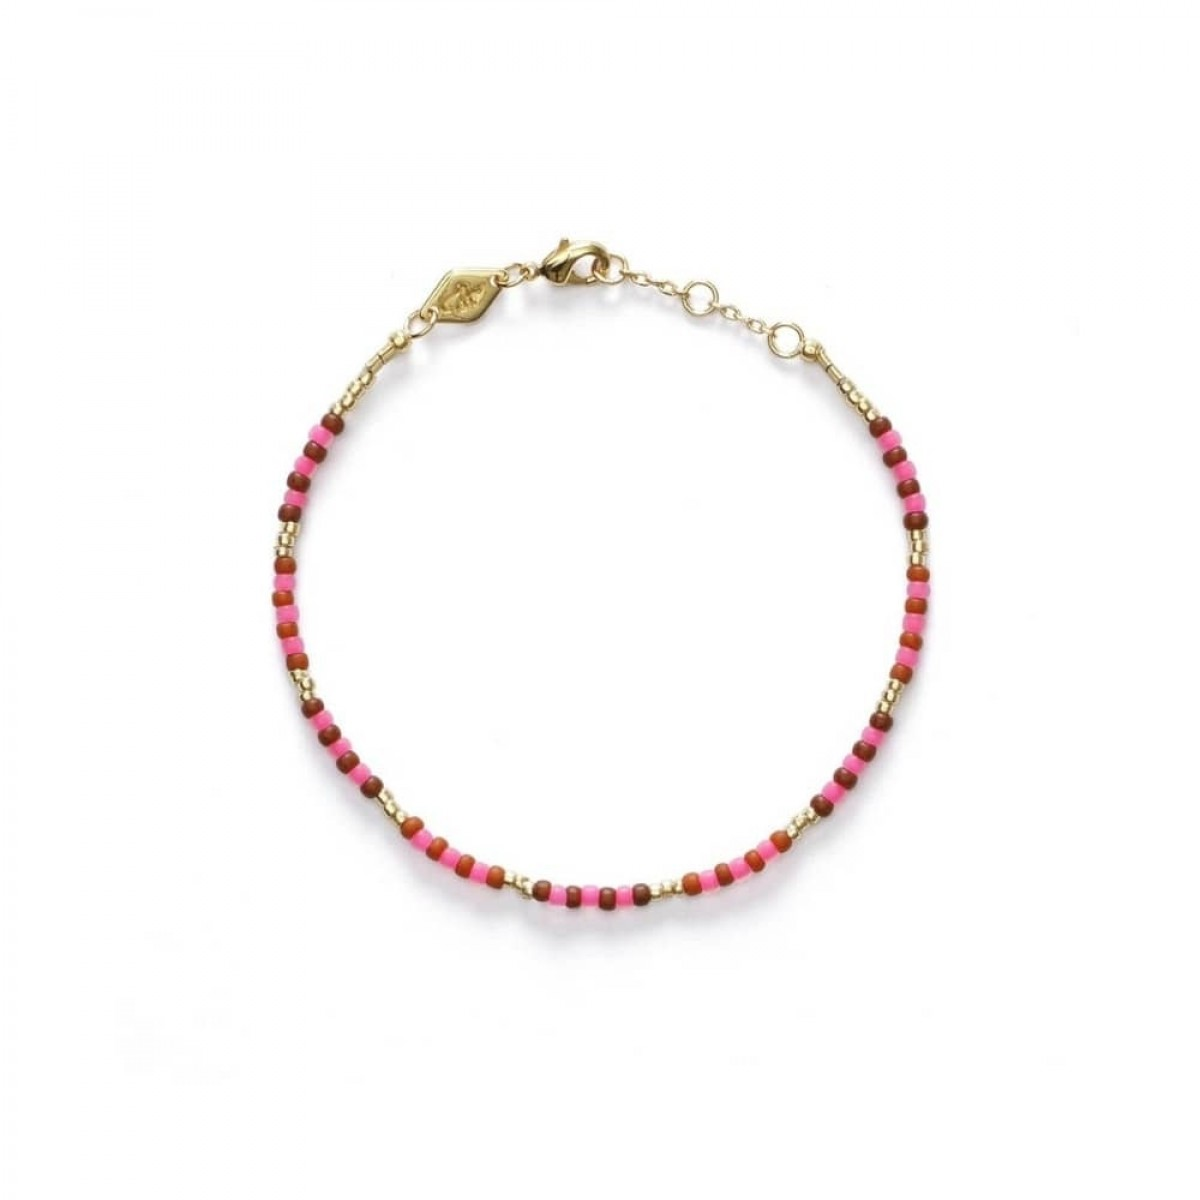 anni lu bundoran bracelet - paradise pink